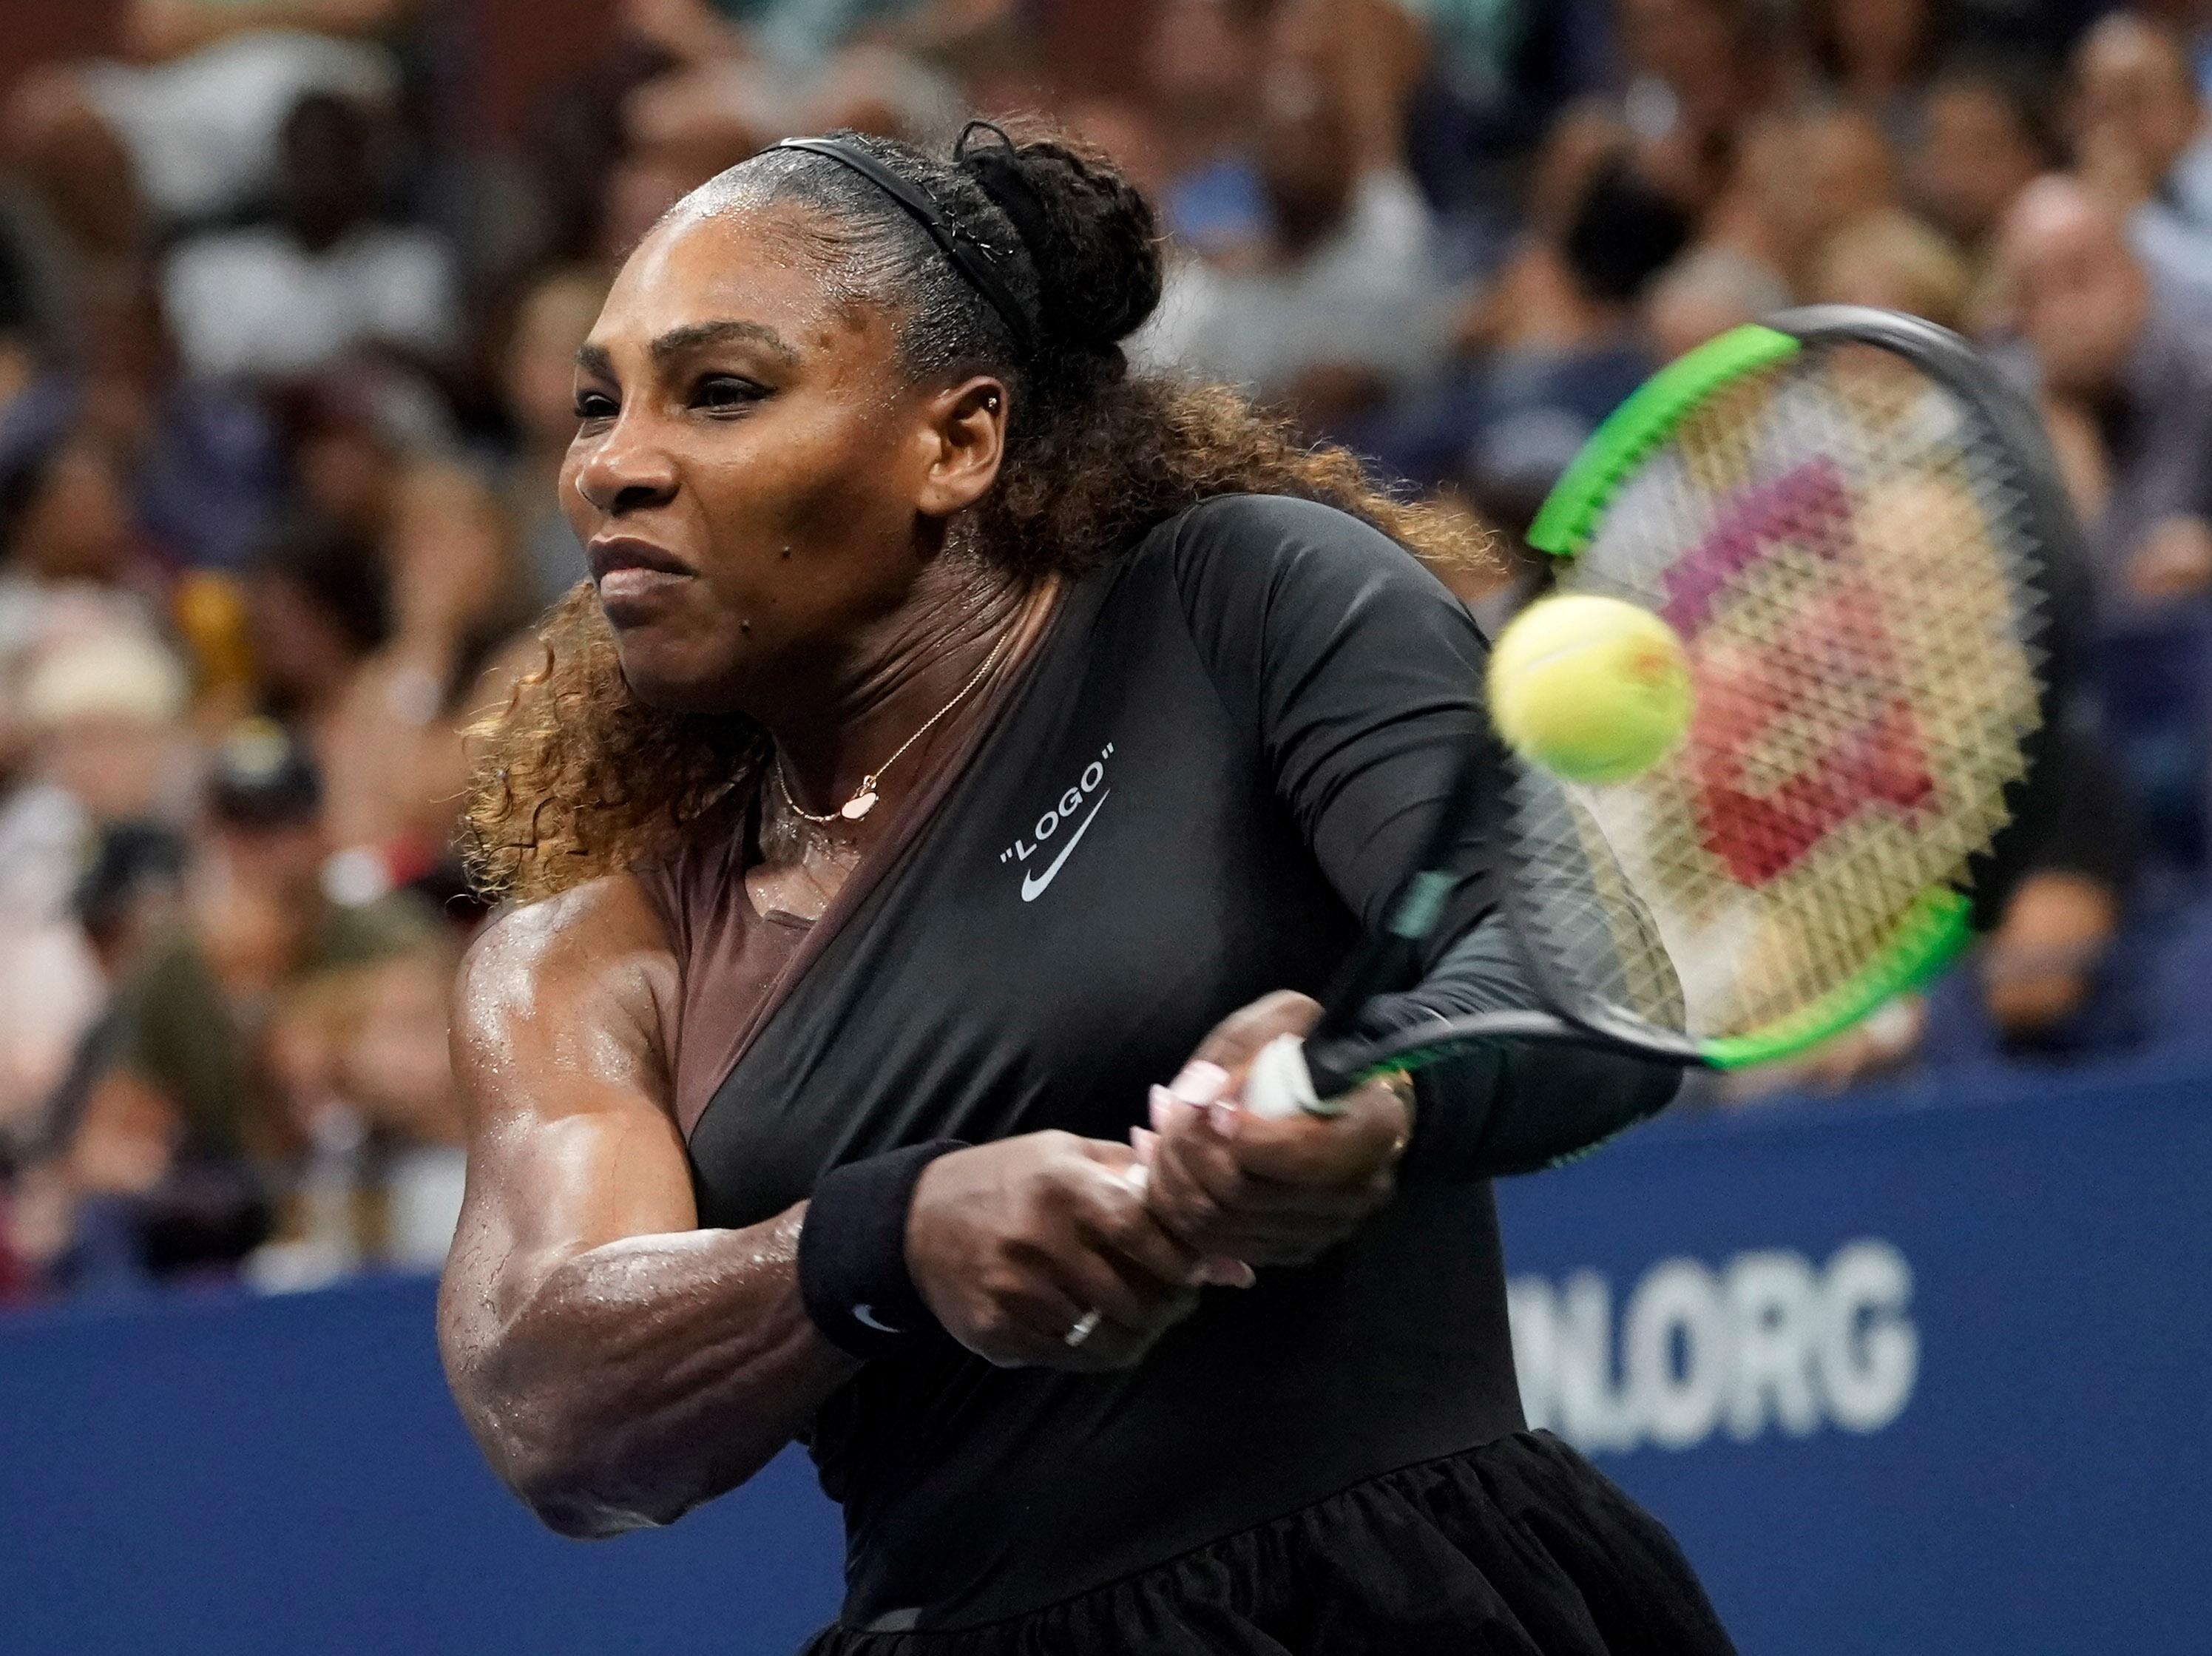 Tennis: Serena crushes Venus in family U.S. Open showdown